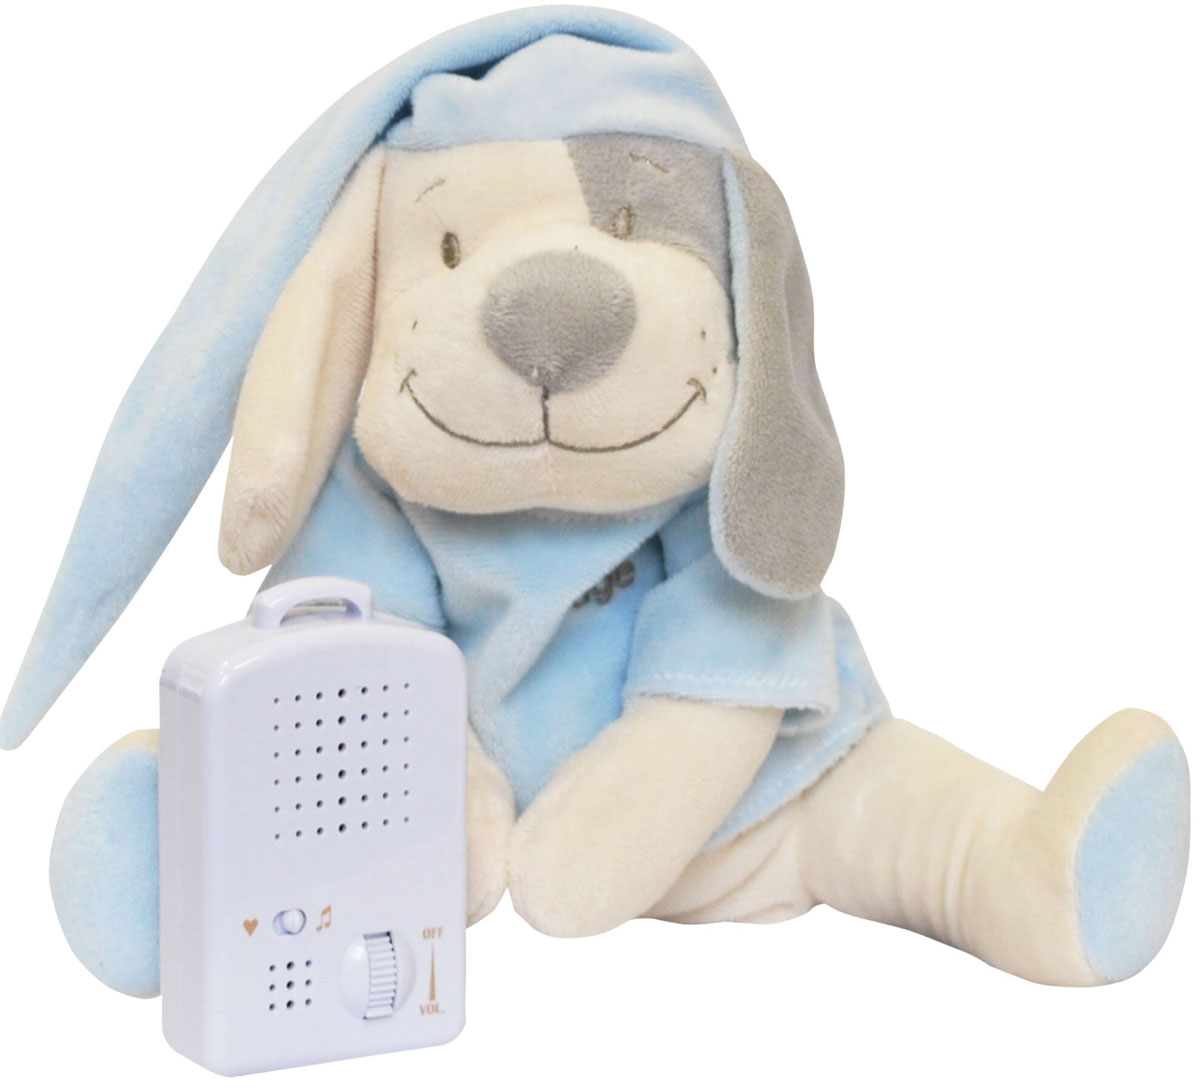 Doodoo Babiage Электронная игрушка Собачка цвет голубой 29 см - Интерактивные игрушки